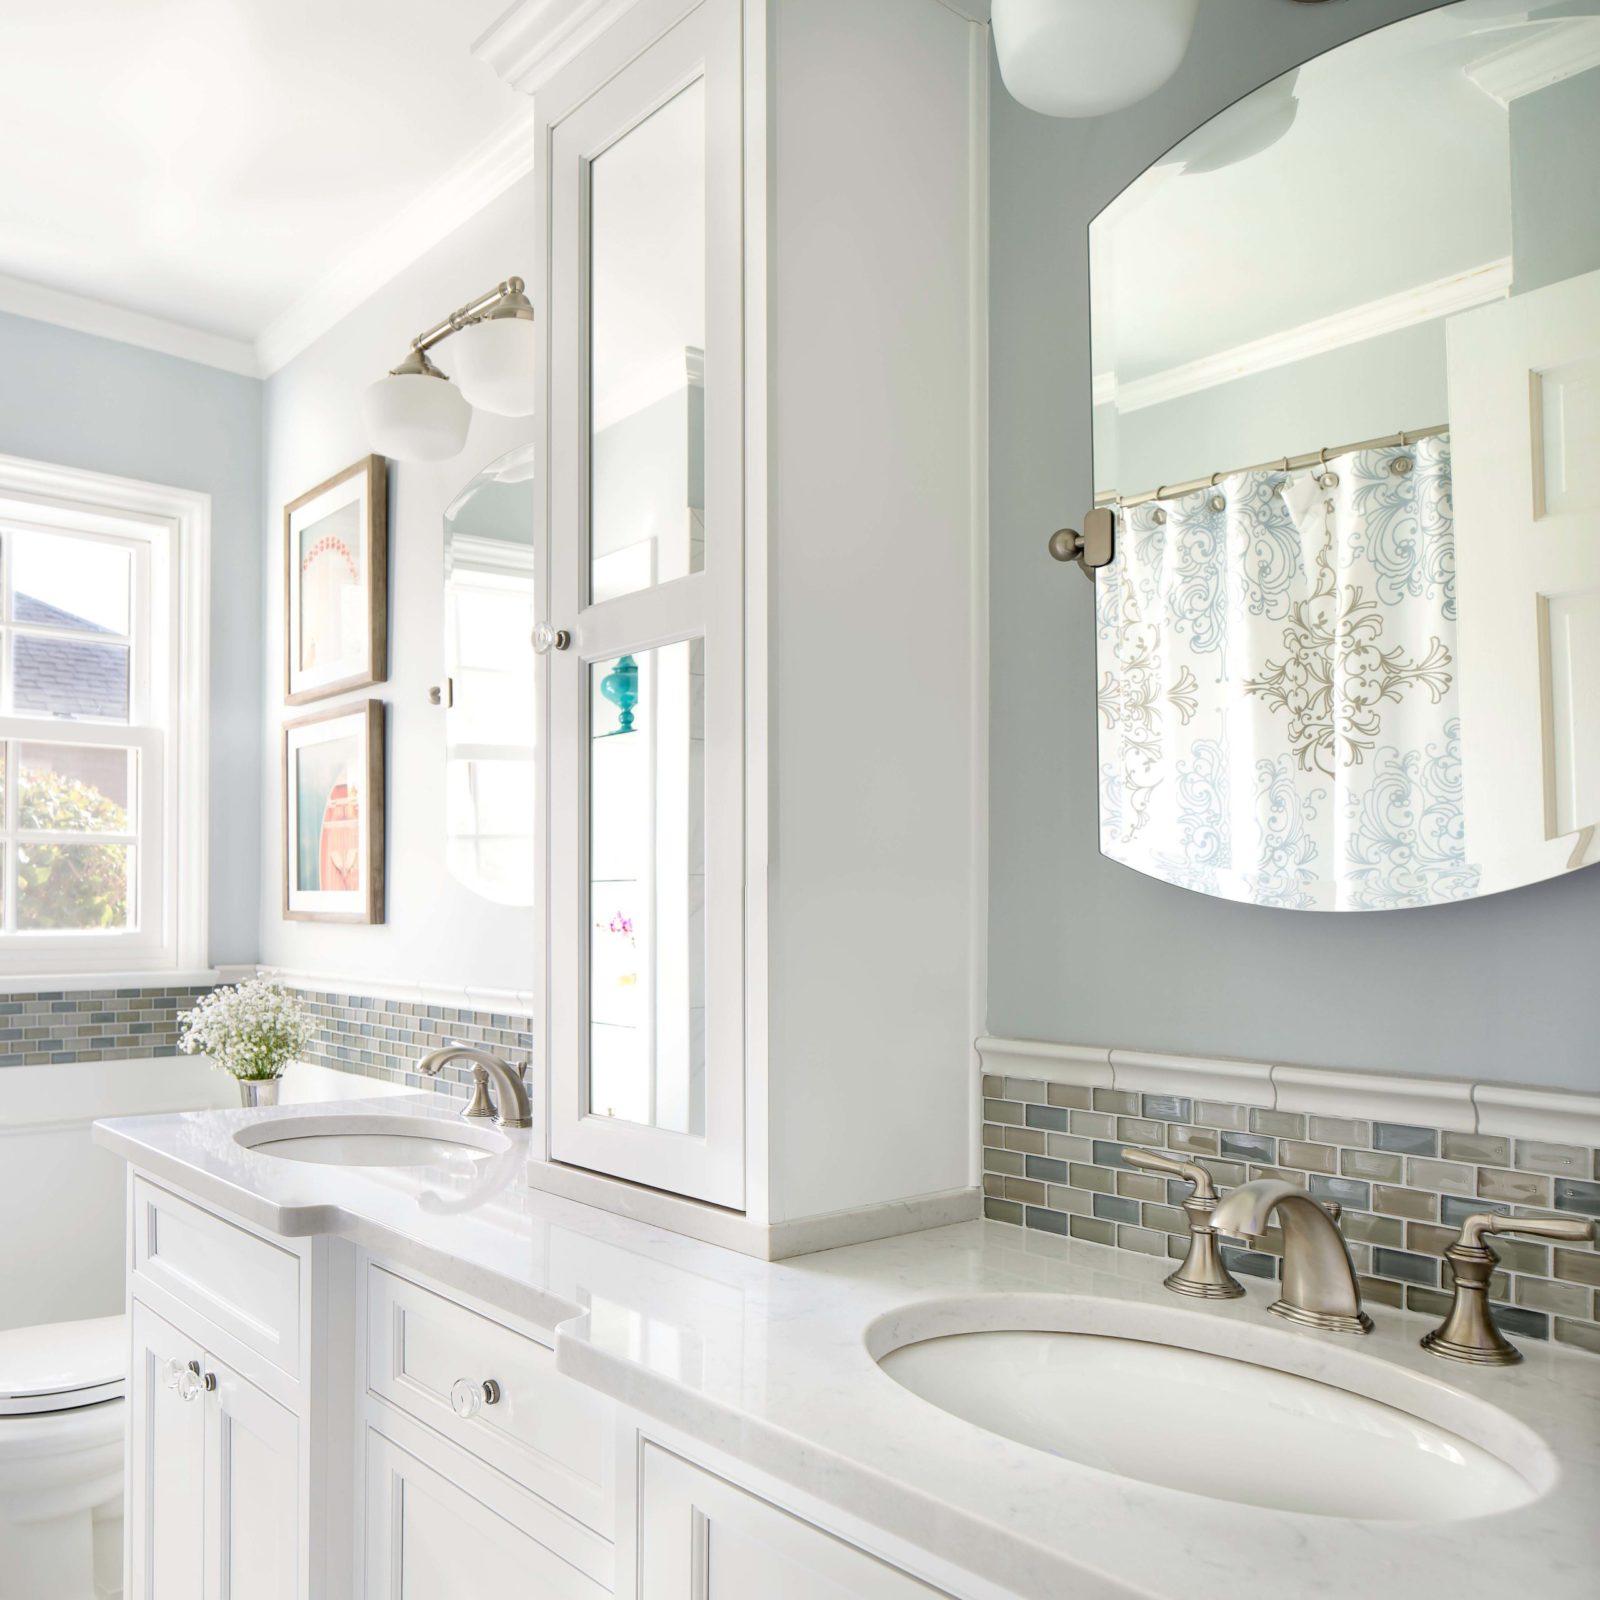 bath-redesign-revision-design-small-hall-bathroom-design